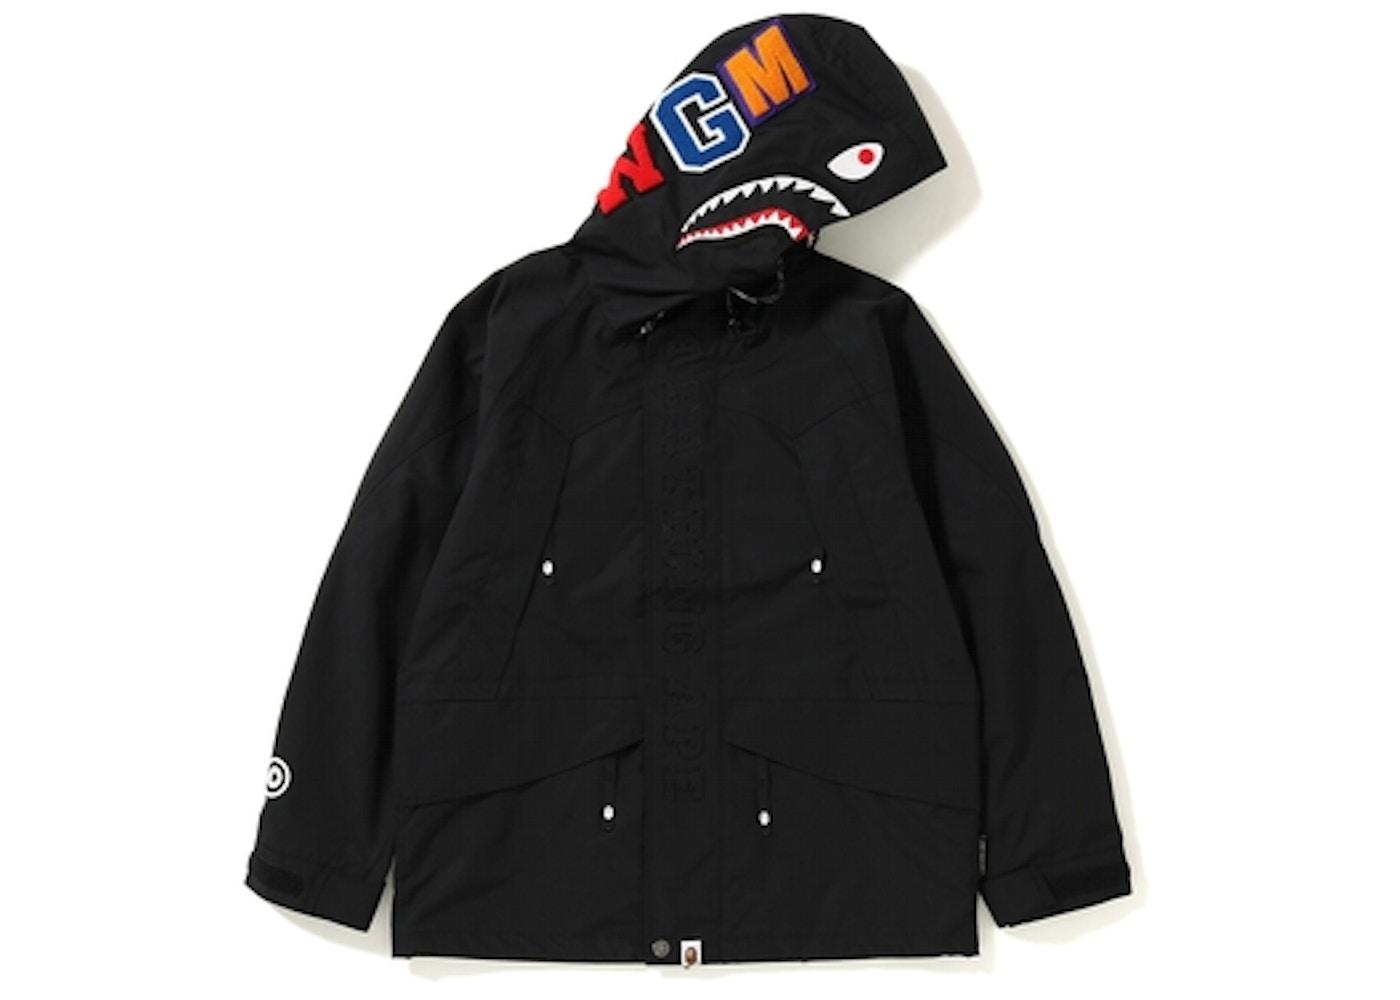 f3c4b93892dc BAPE Shark Snowboard Jacket Black. Shark Snowboard